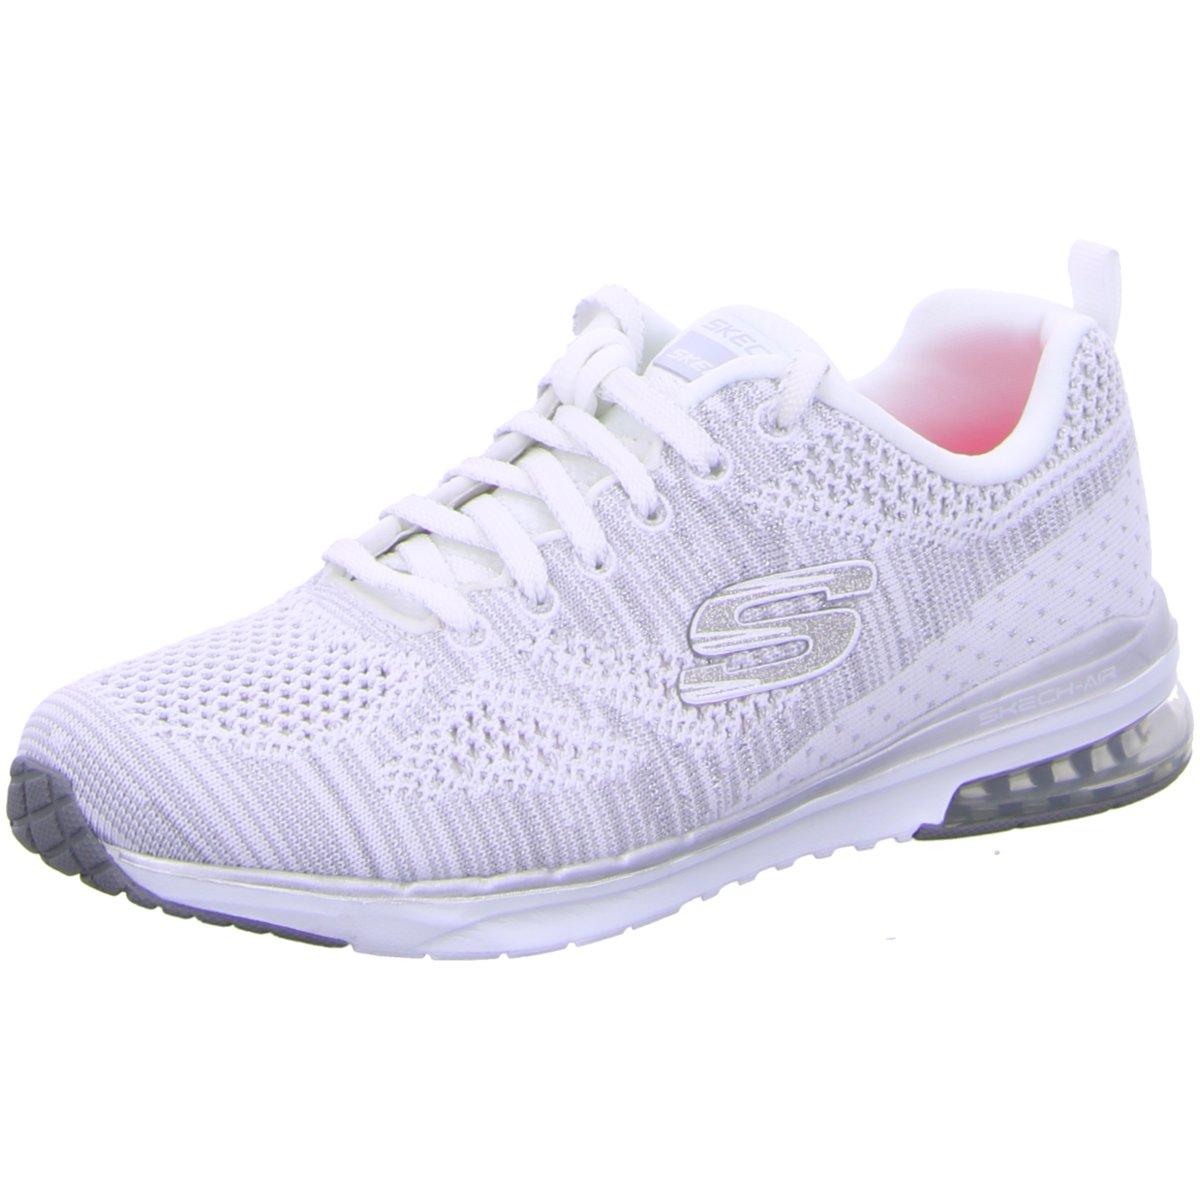 NEU Skechers Damen Sneaker weiß 12114WSL weiß 94295